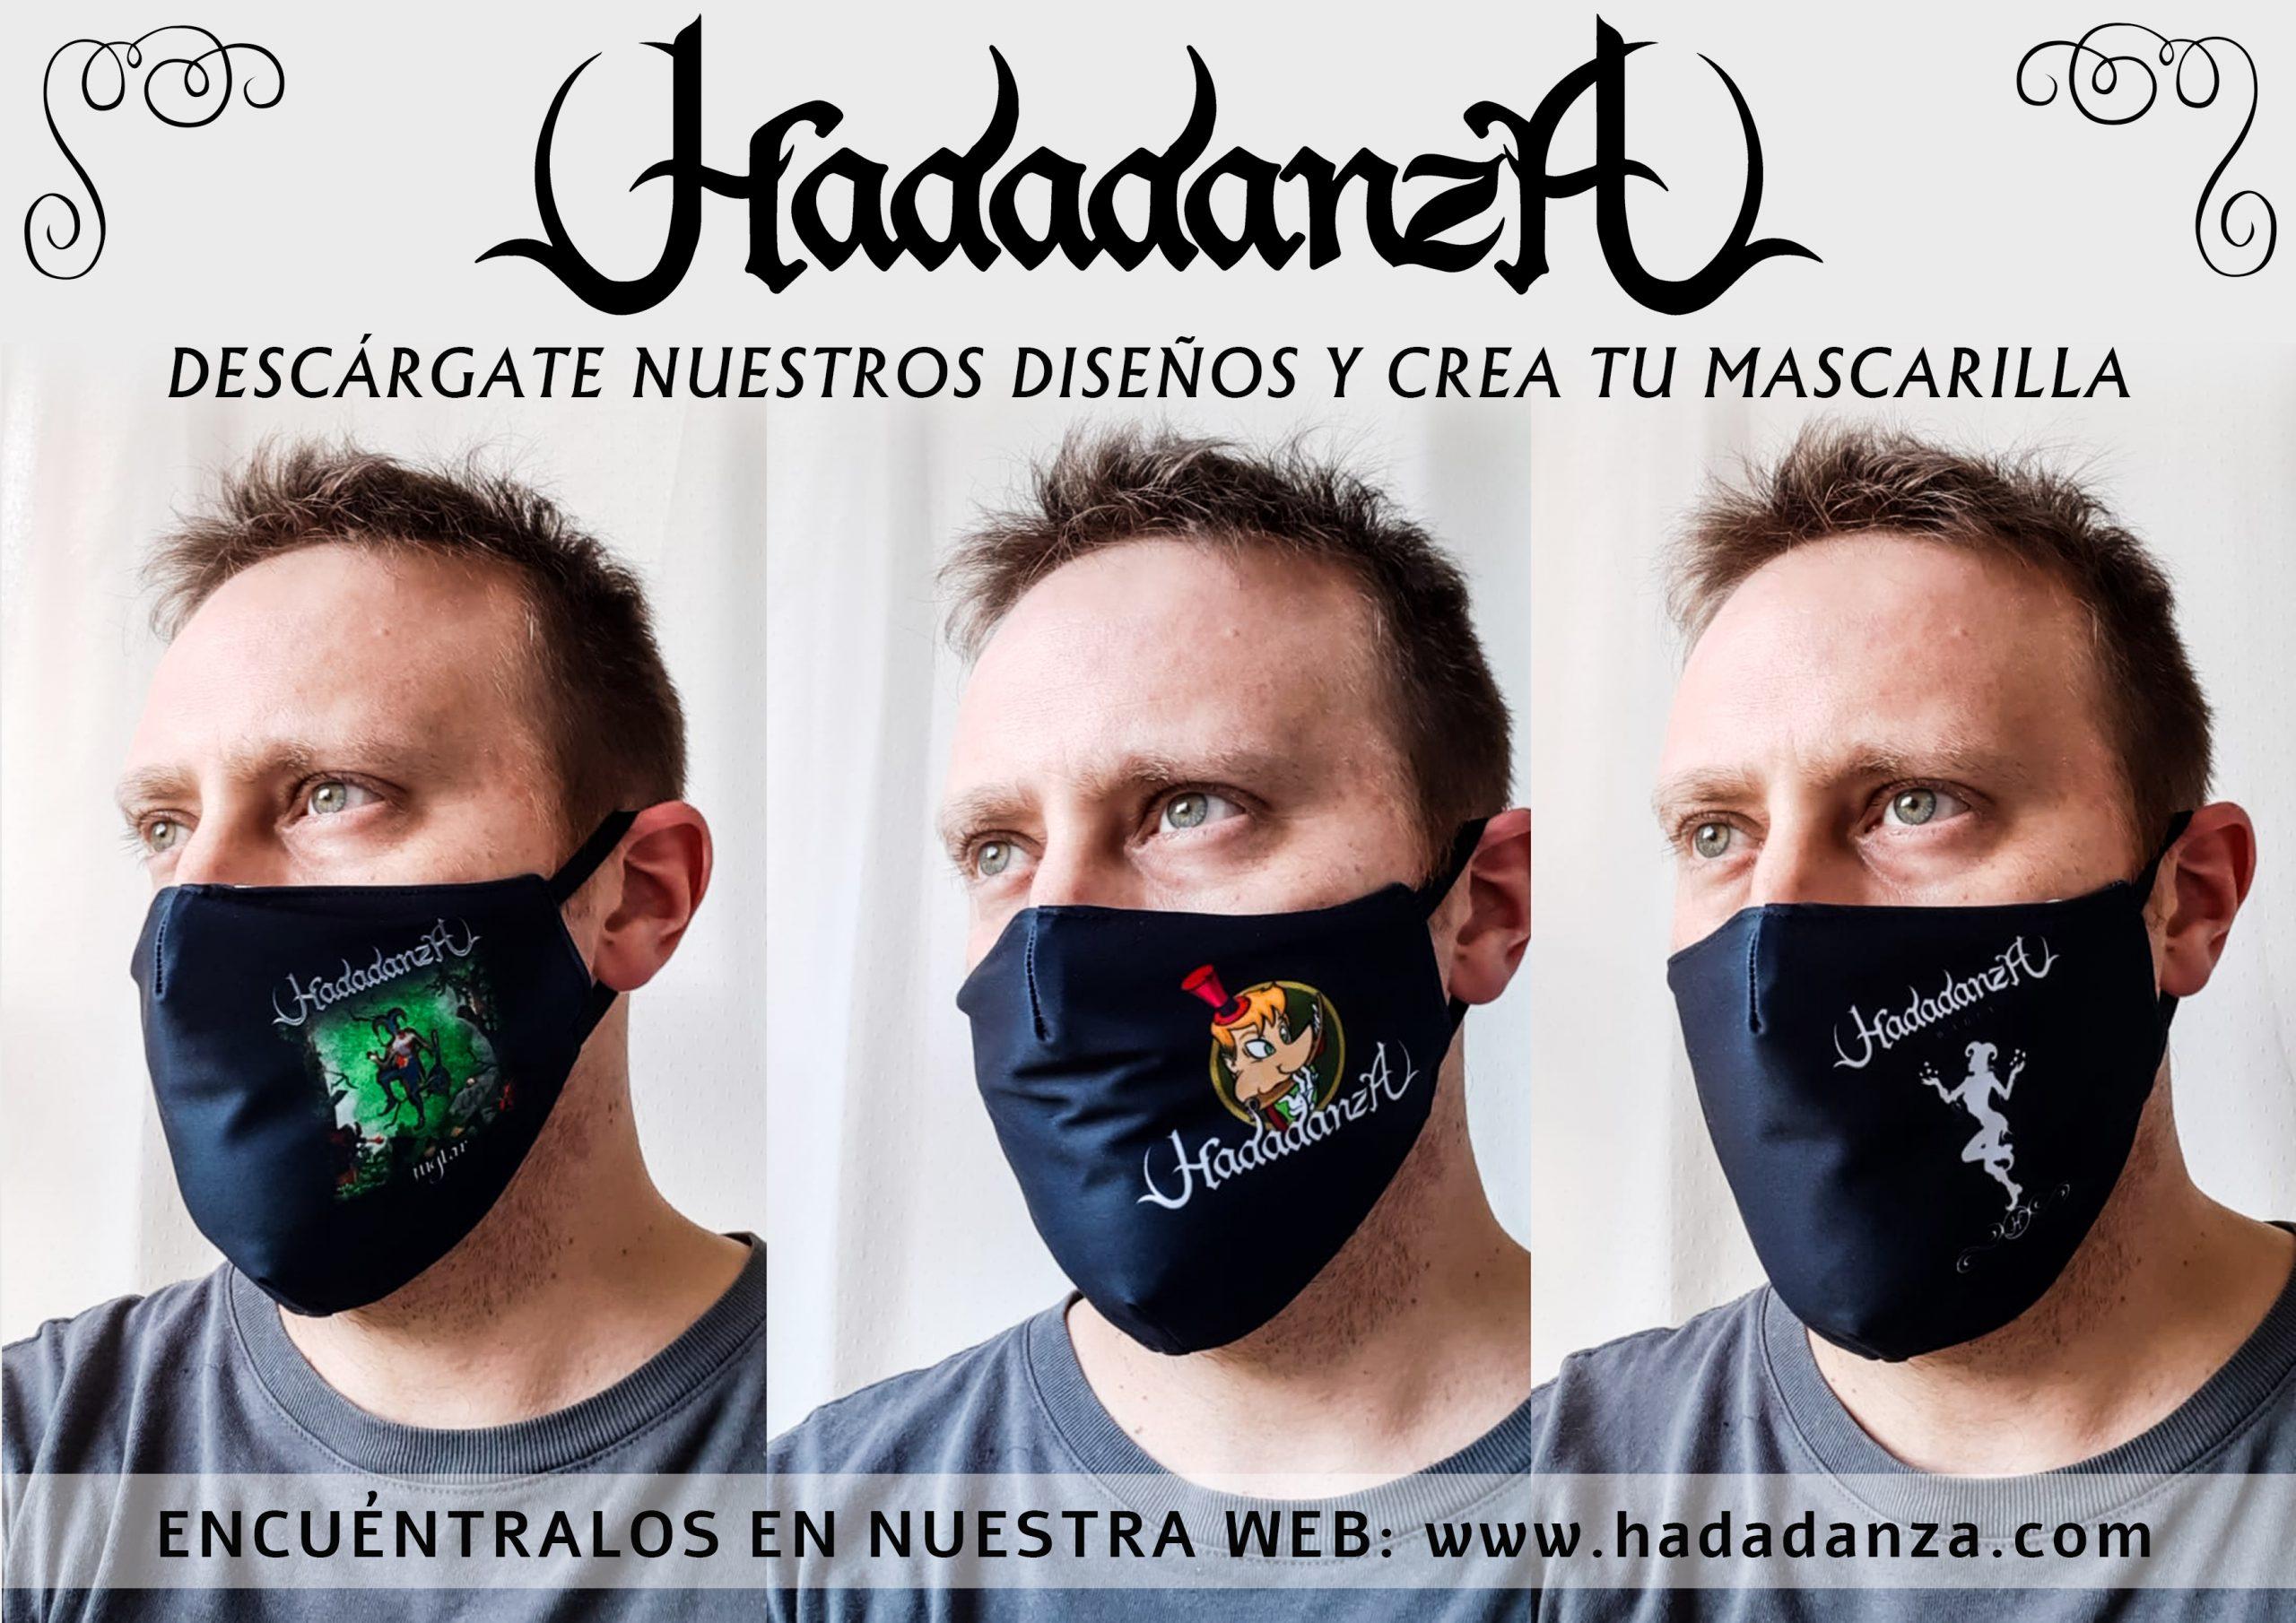 FOLK METAL ROCK - MASCARILLAS HADADANZA